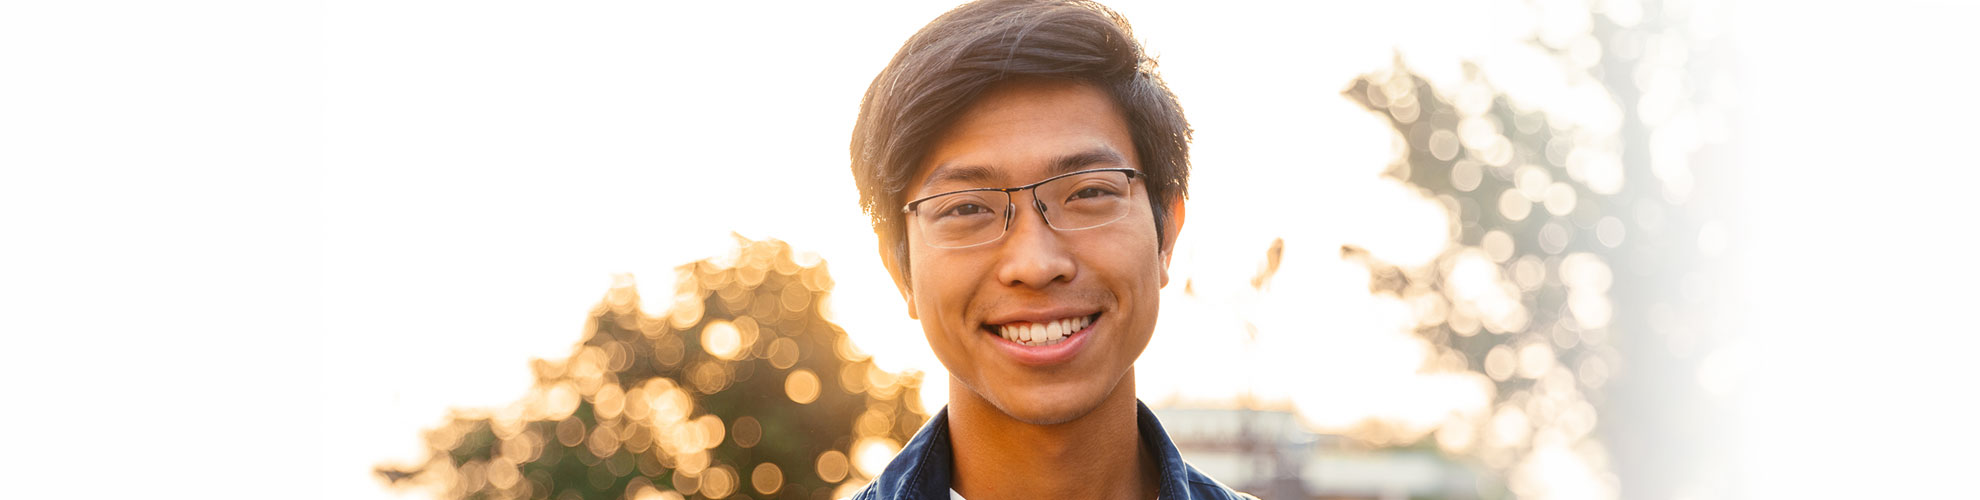 young male eyeglasse